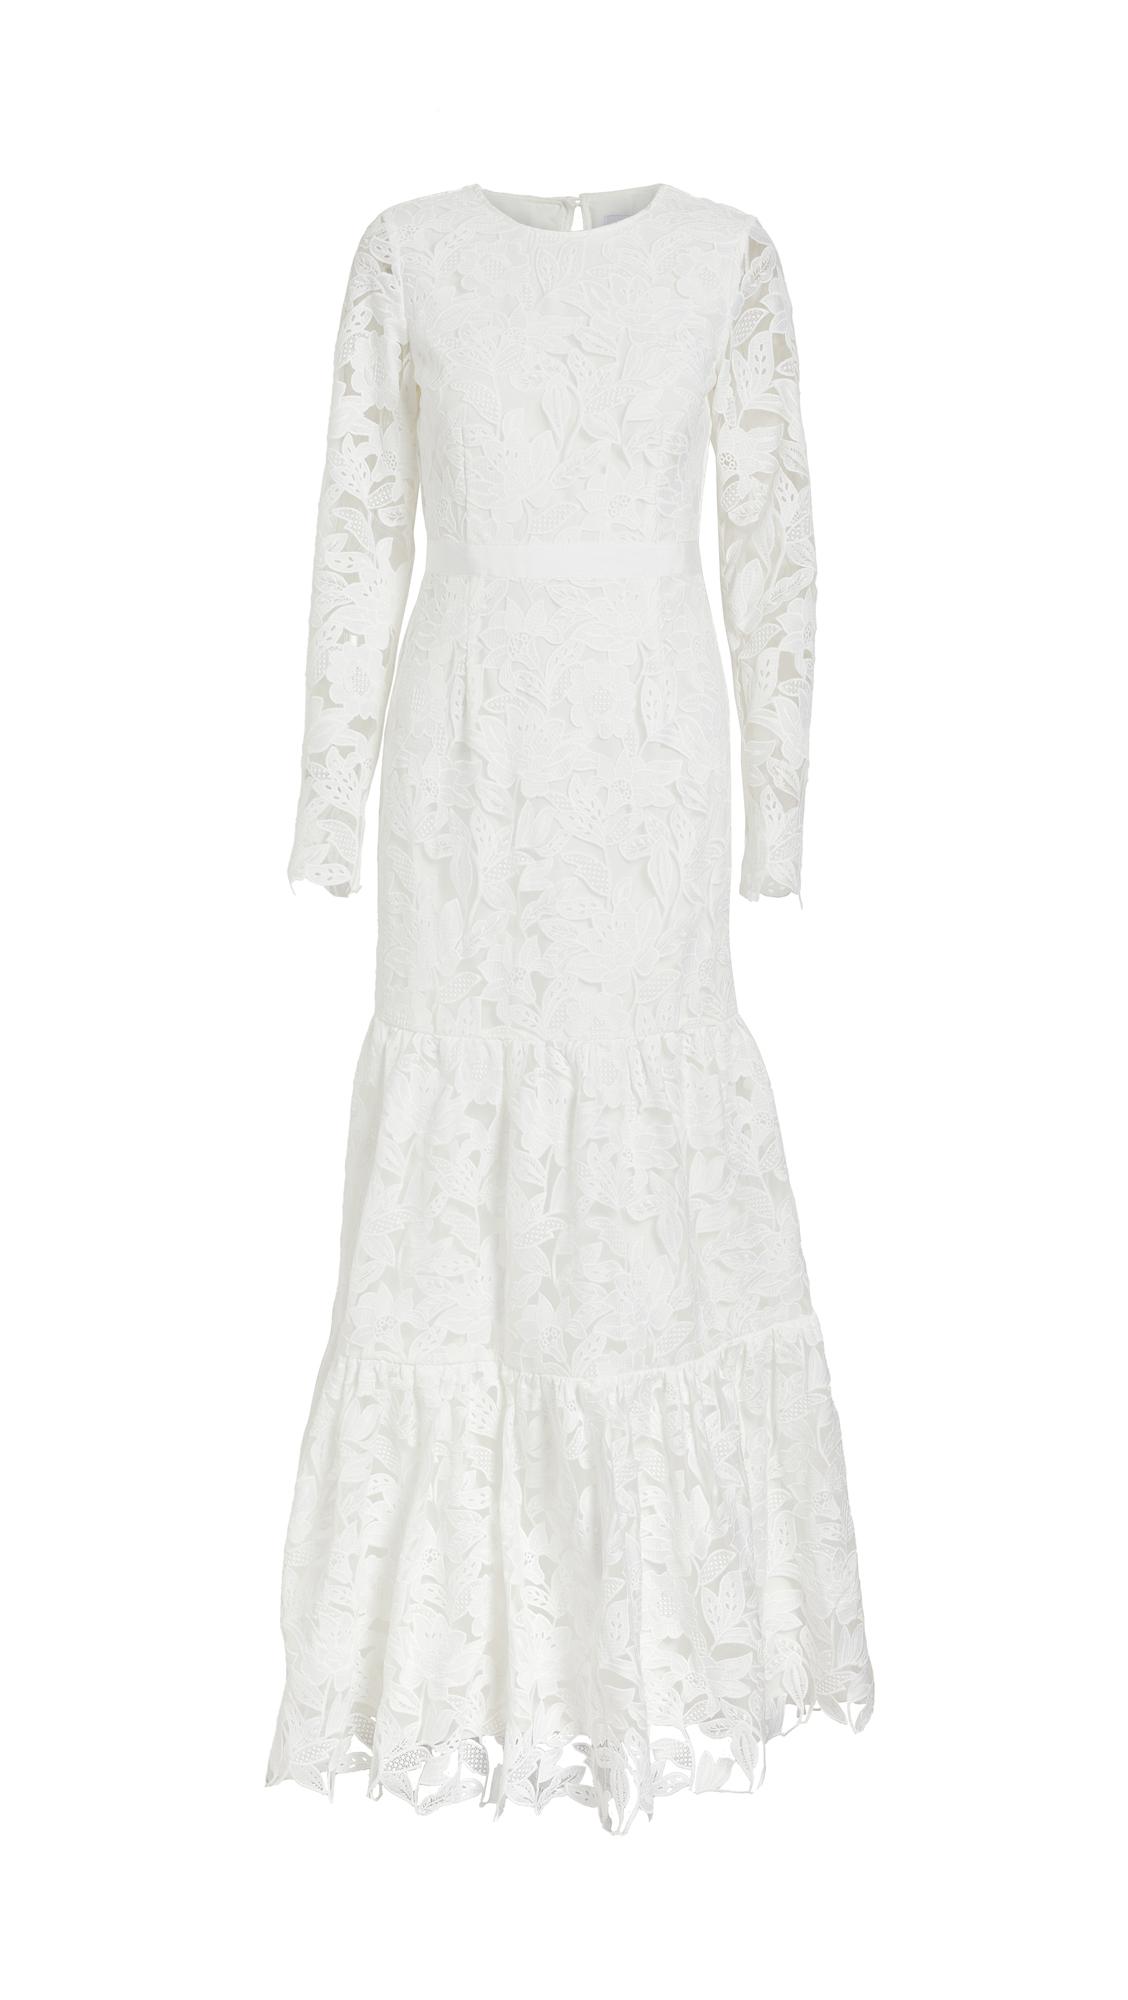 Self Portrait Leaf Guipure Maxi Dress - White